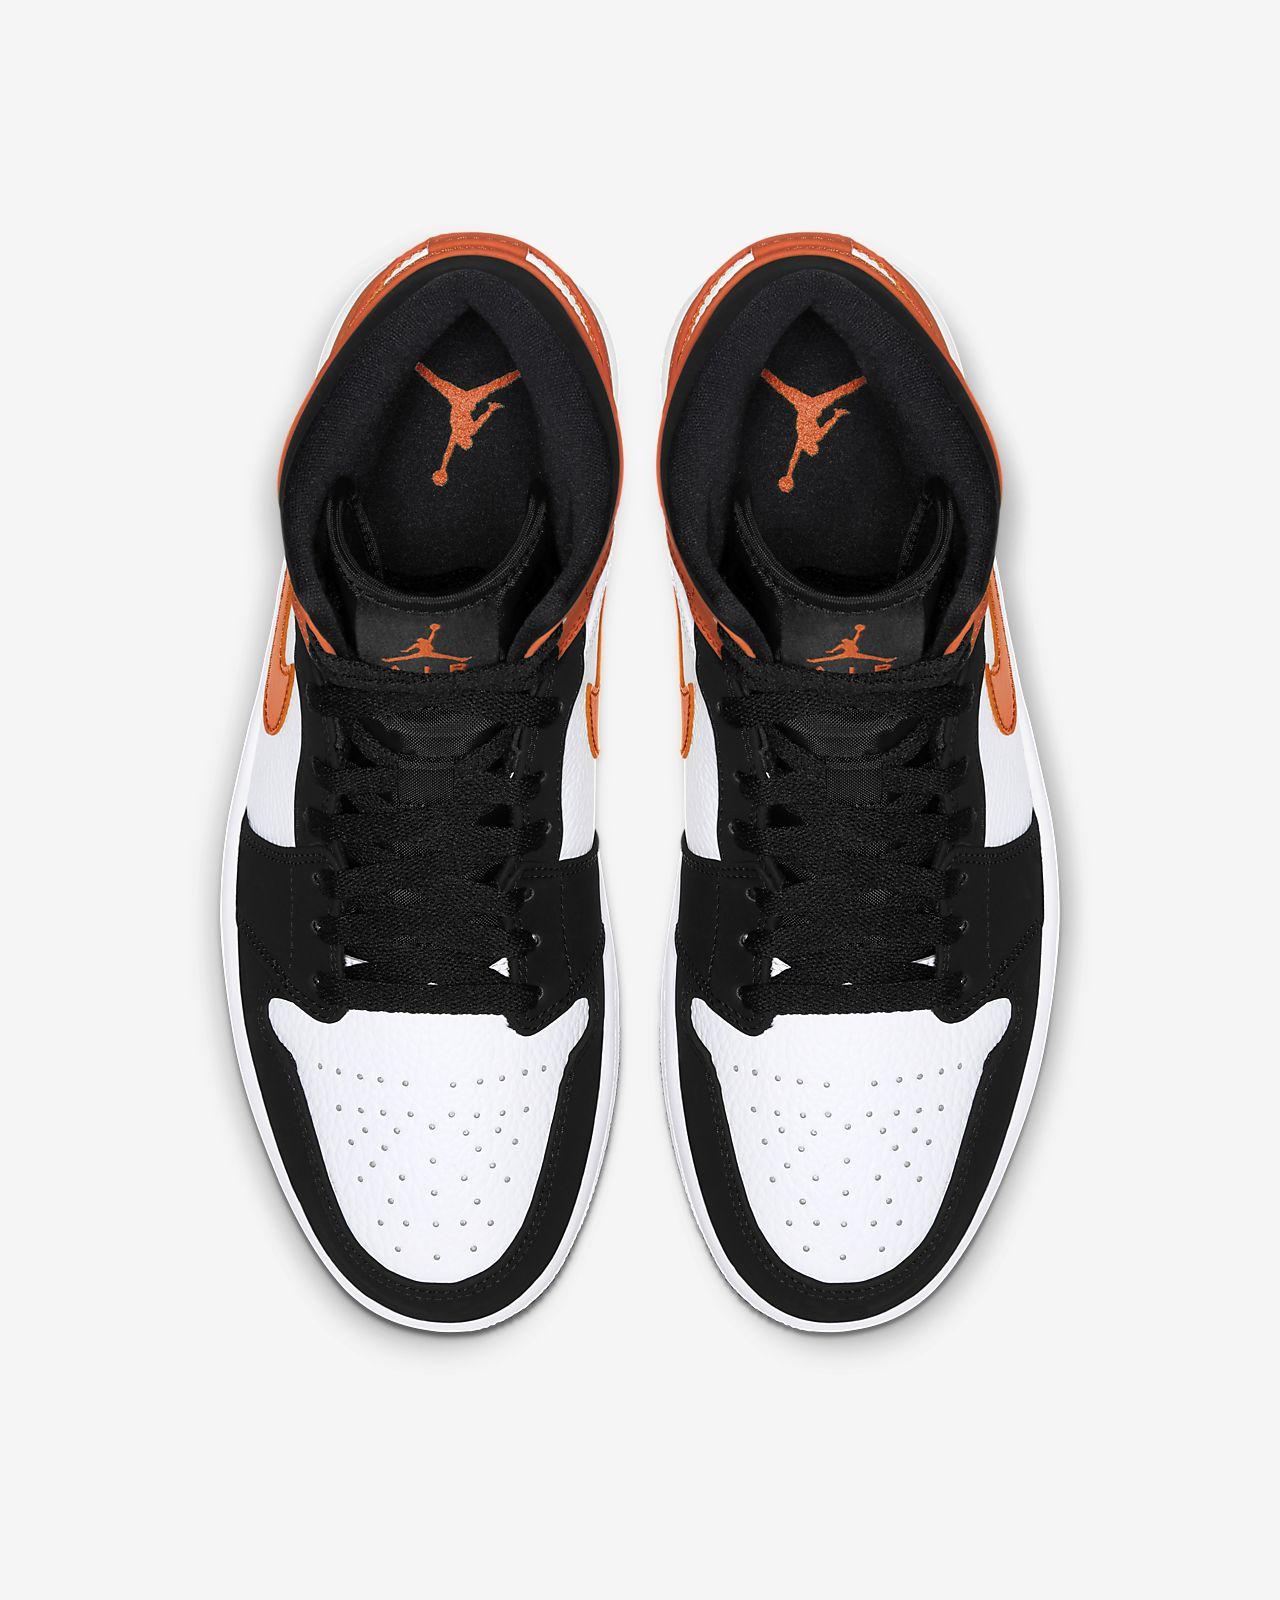 48 Best Nike Mid Basketball Shoes (January 2020) | RunRepeat